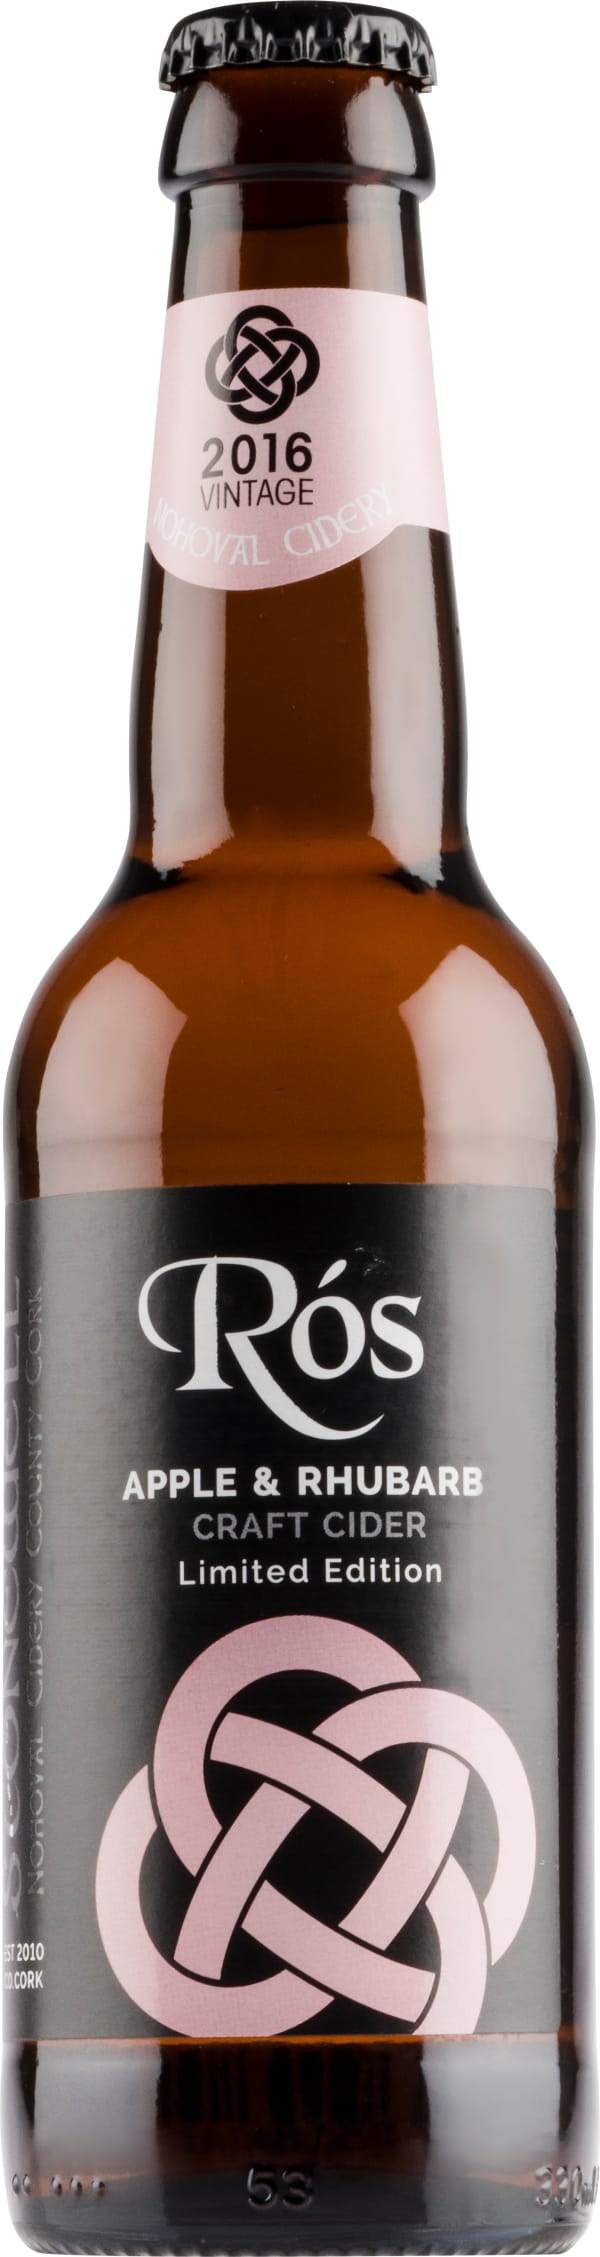 Stonewell Rós Apple & Rhubarb Craft Cider